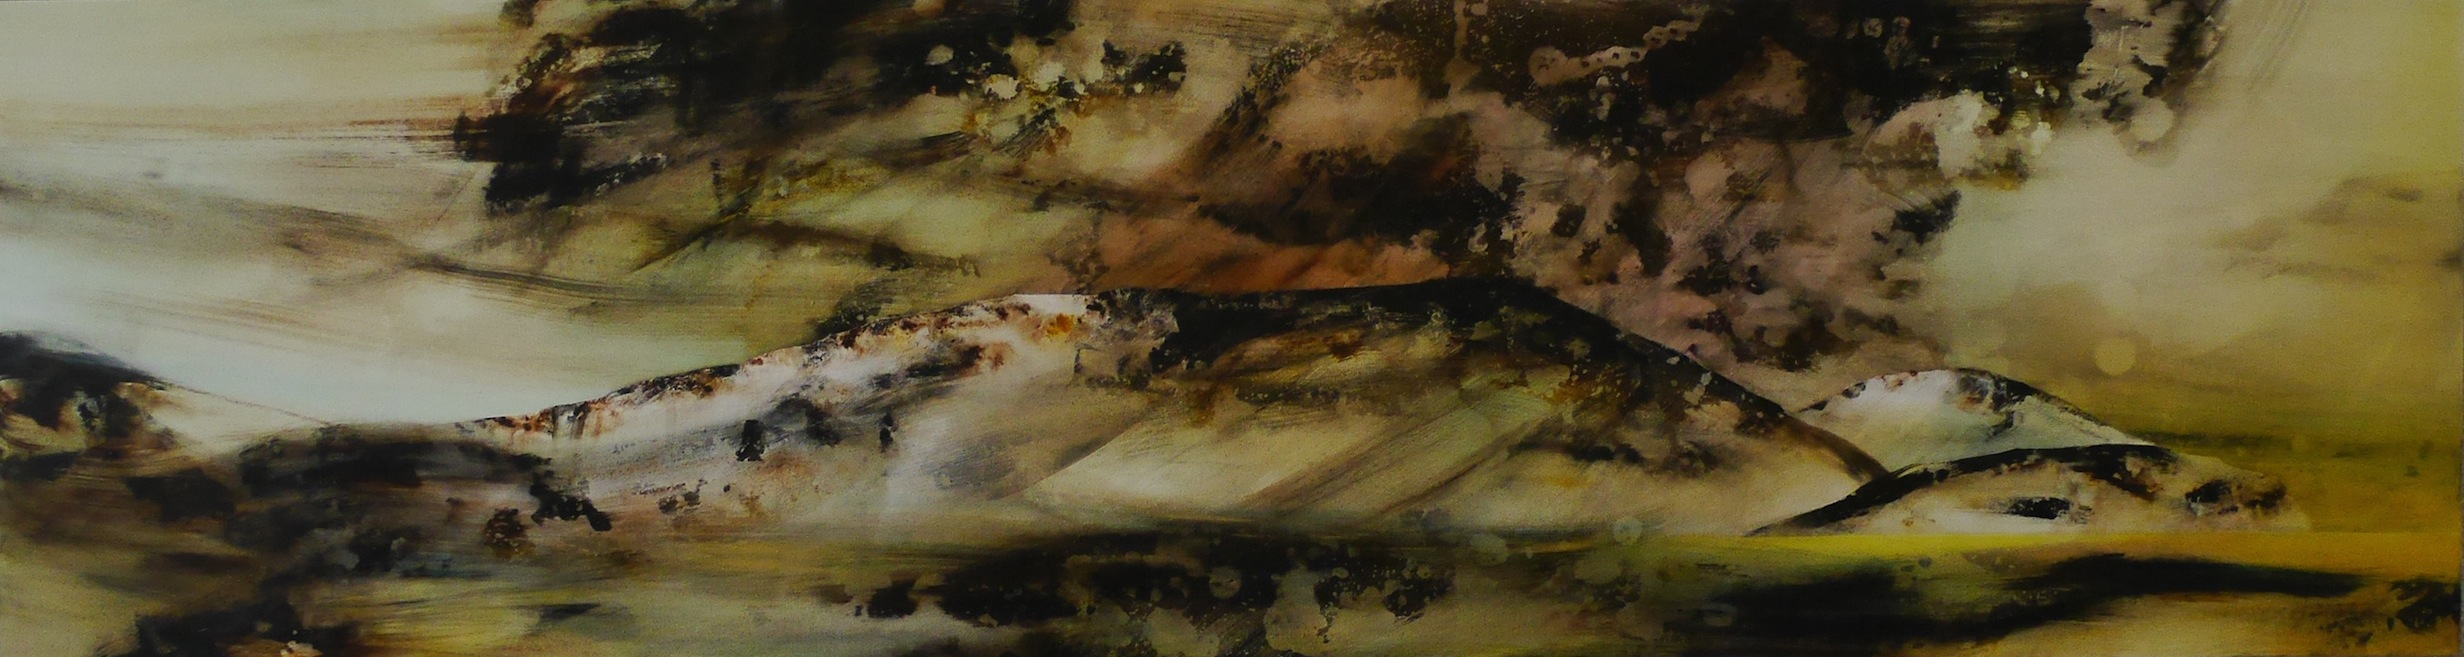 Wyn-Lyn TAN  In(visible) Horizons VII  2017 Acrylic on canvas H54 x W200 x D2 cm